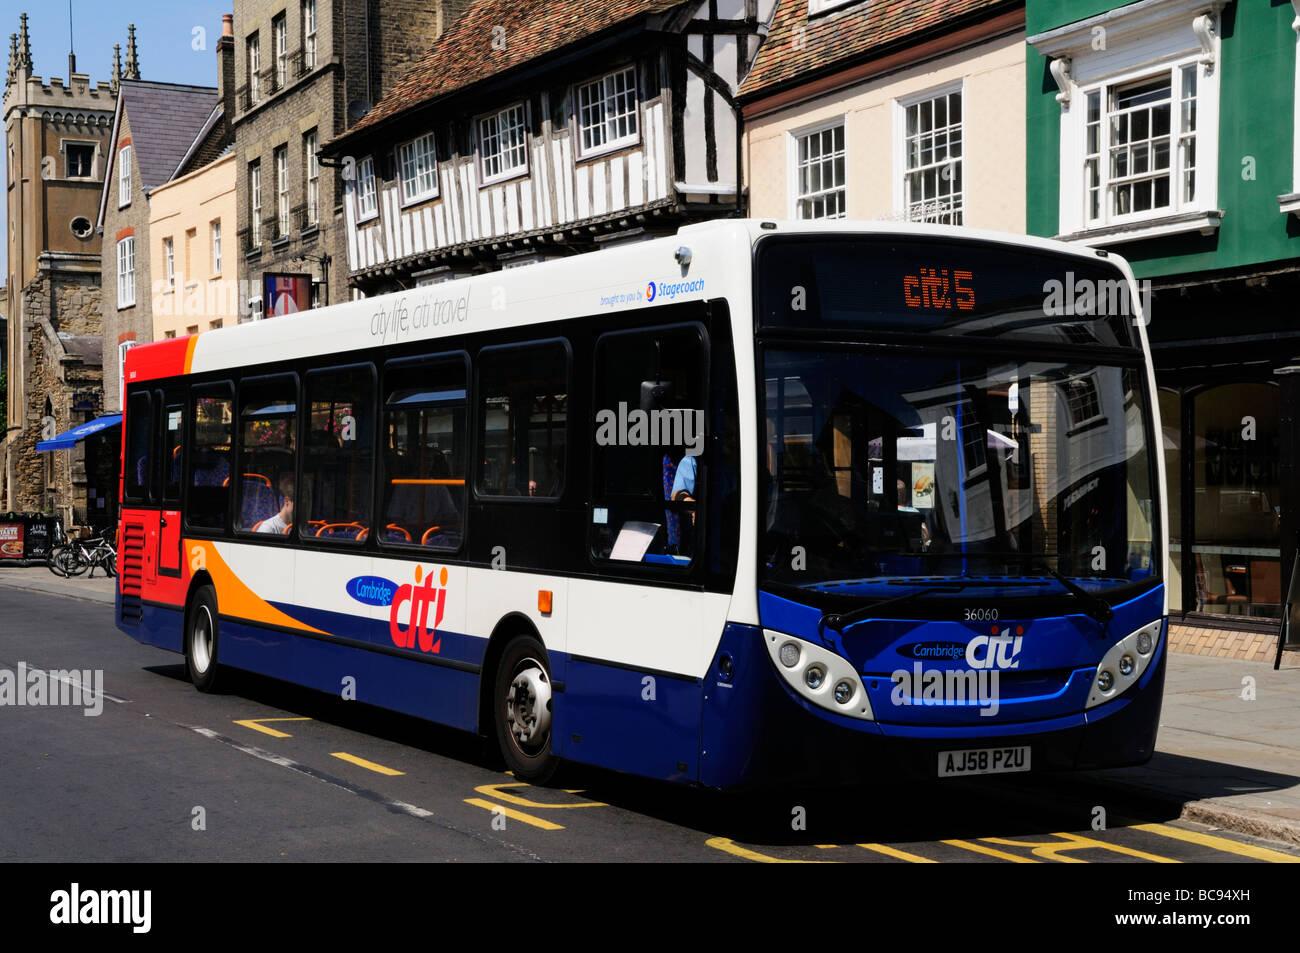 A  Stagecoach Citi 5 single decker bus in Bridge Street ,Cambridge, England, UK - Stock Image